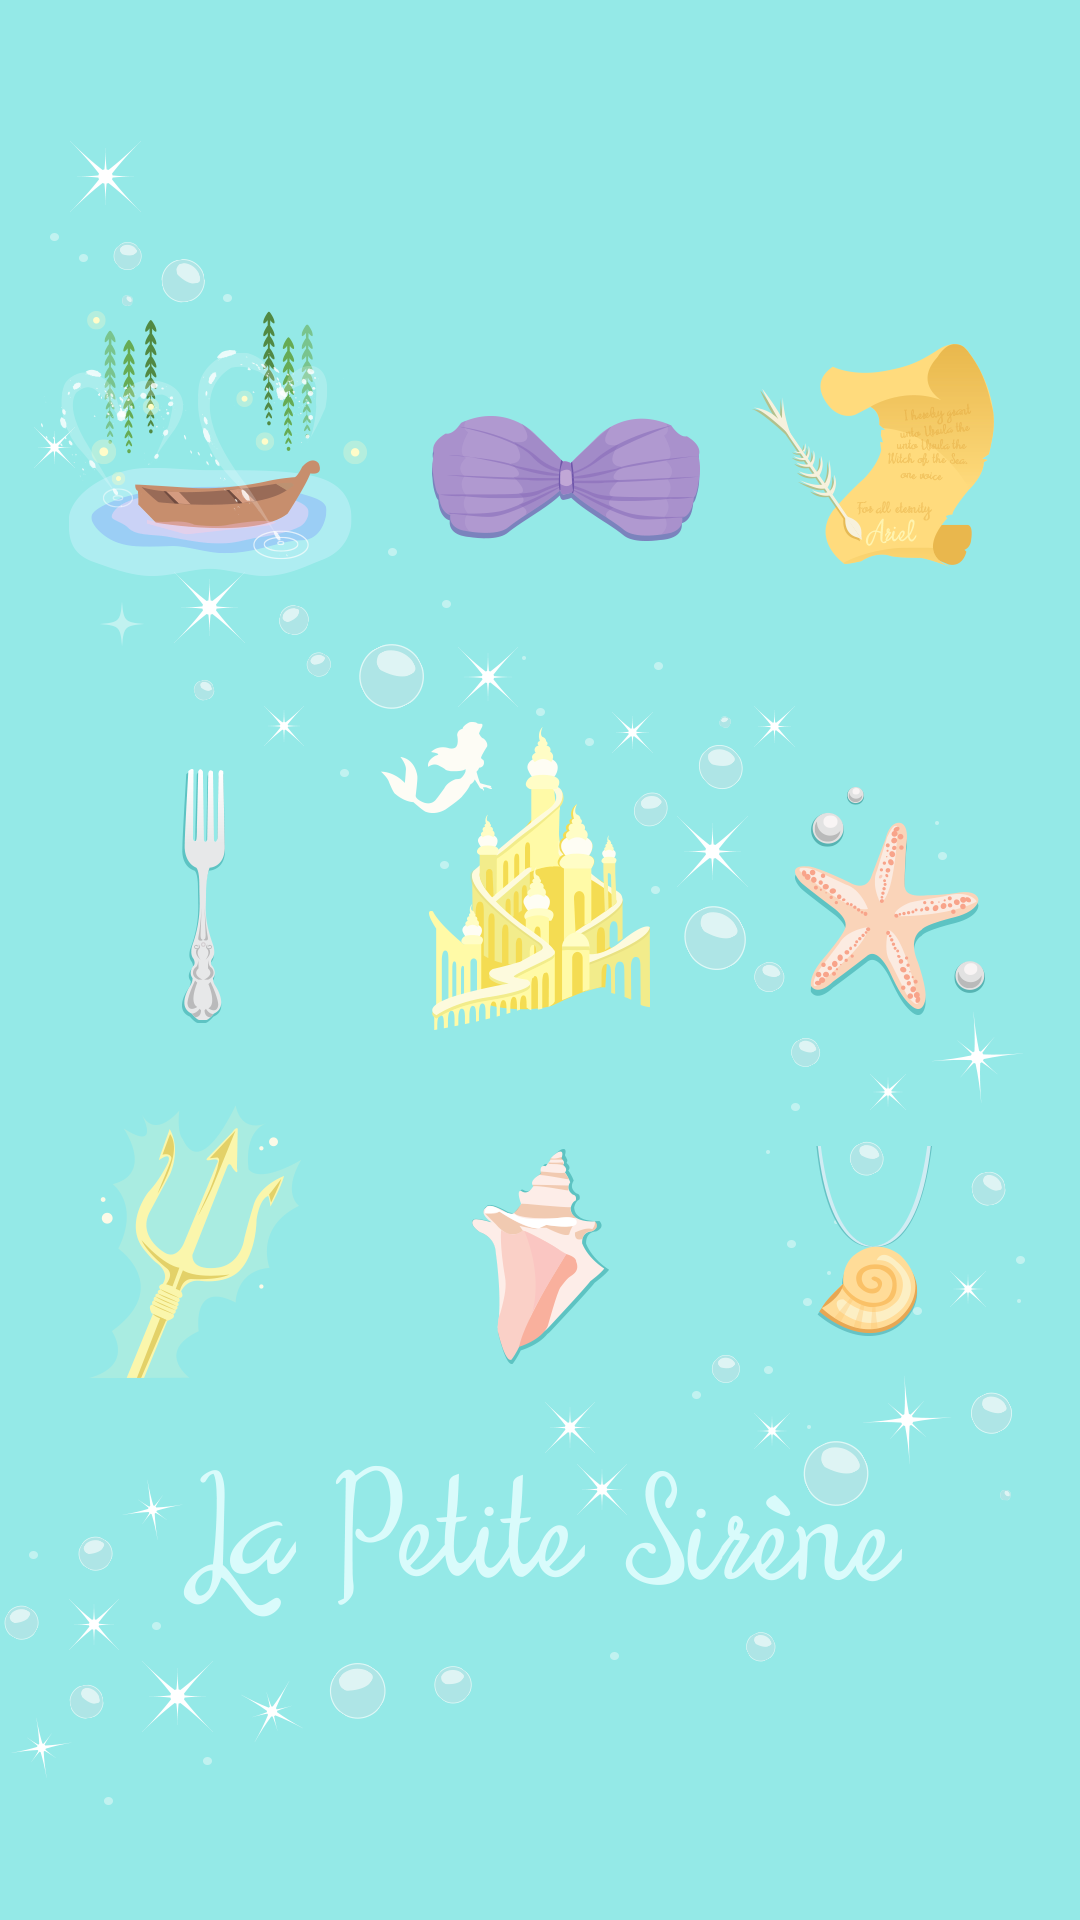 Iphone La Petite Sirene Little Mermaid Ariel Wallpaper Crecre Fond Decran